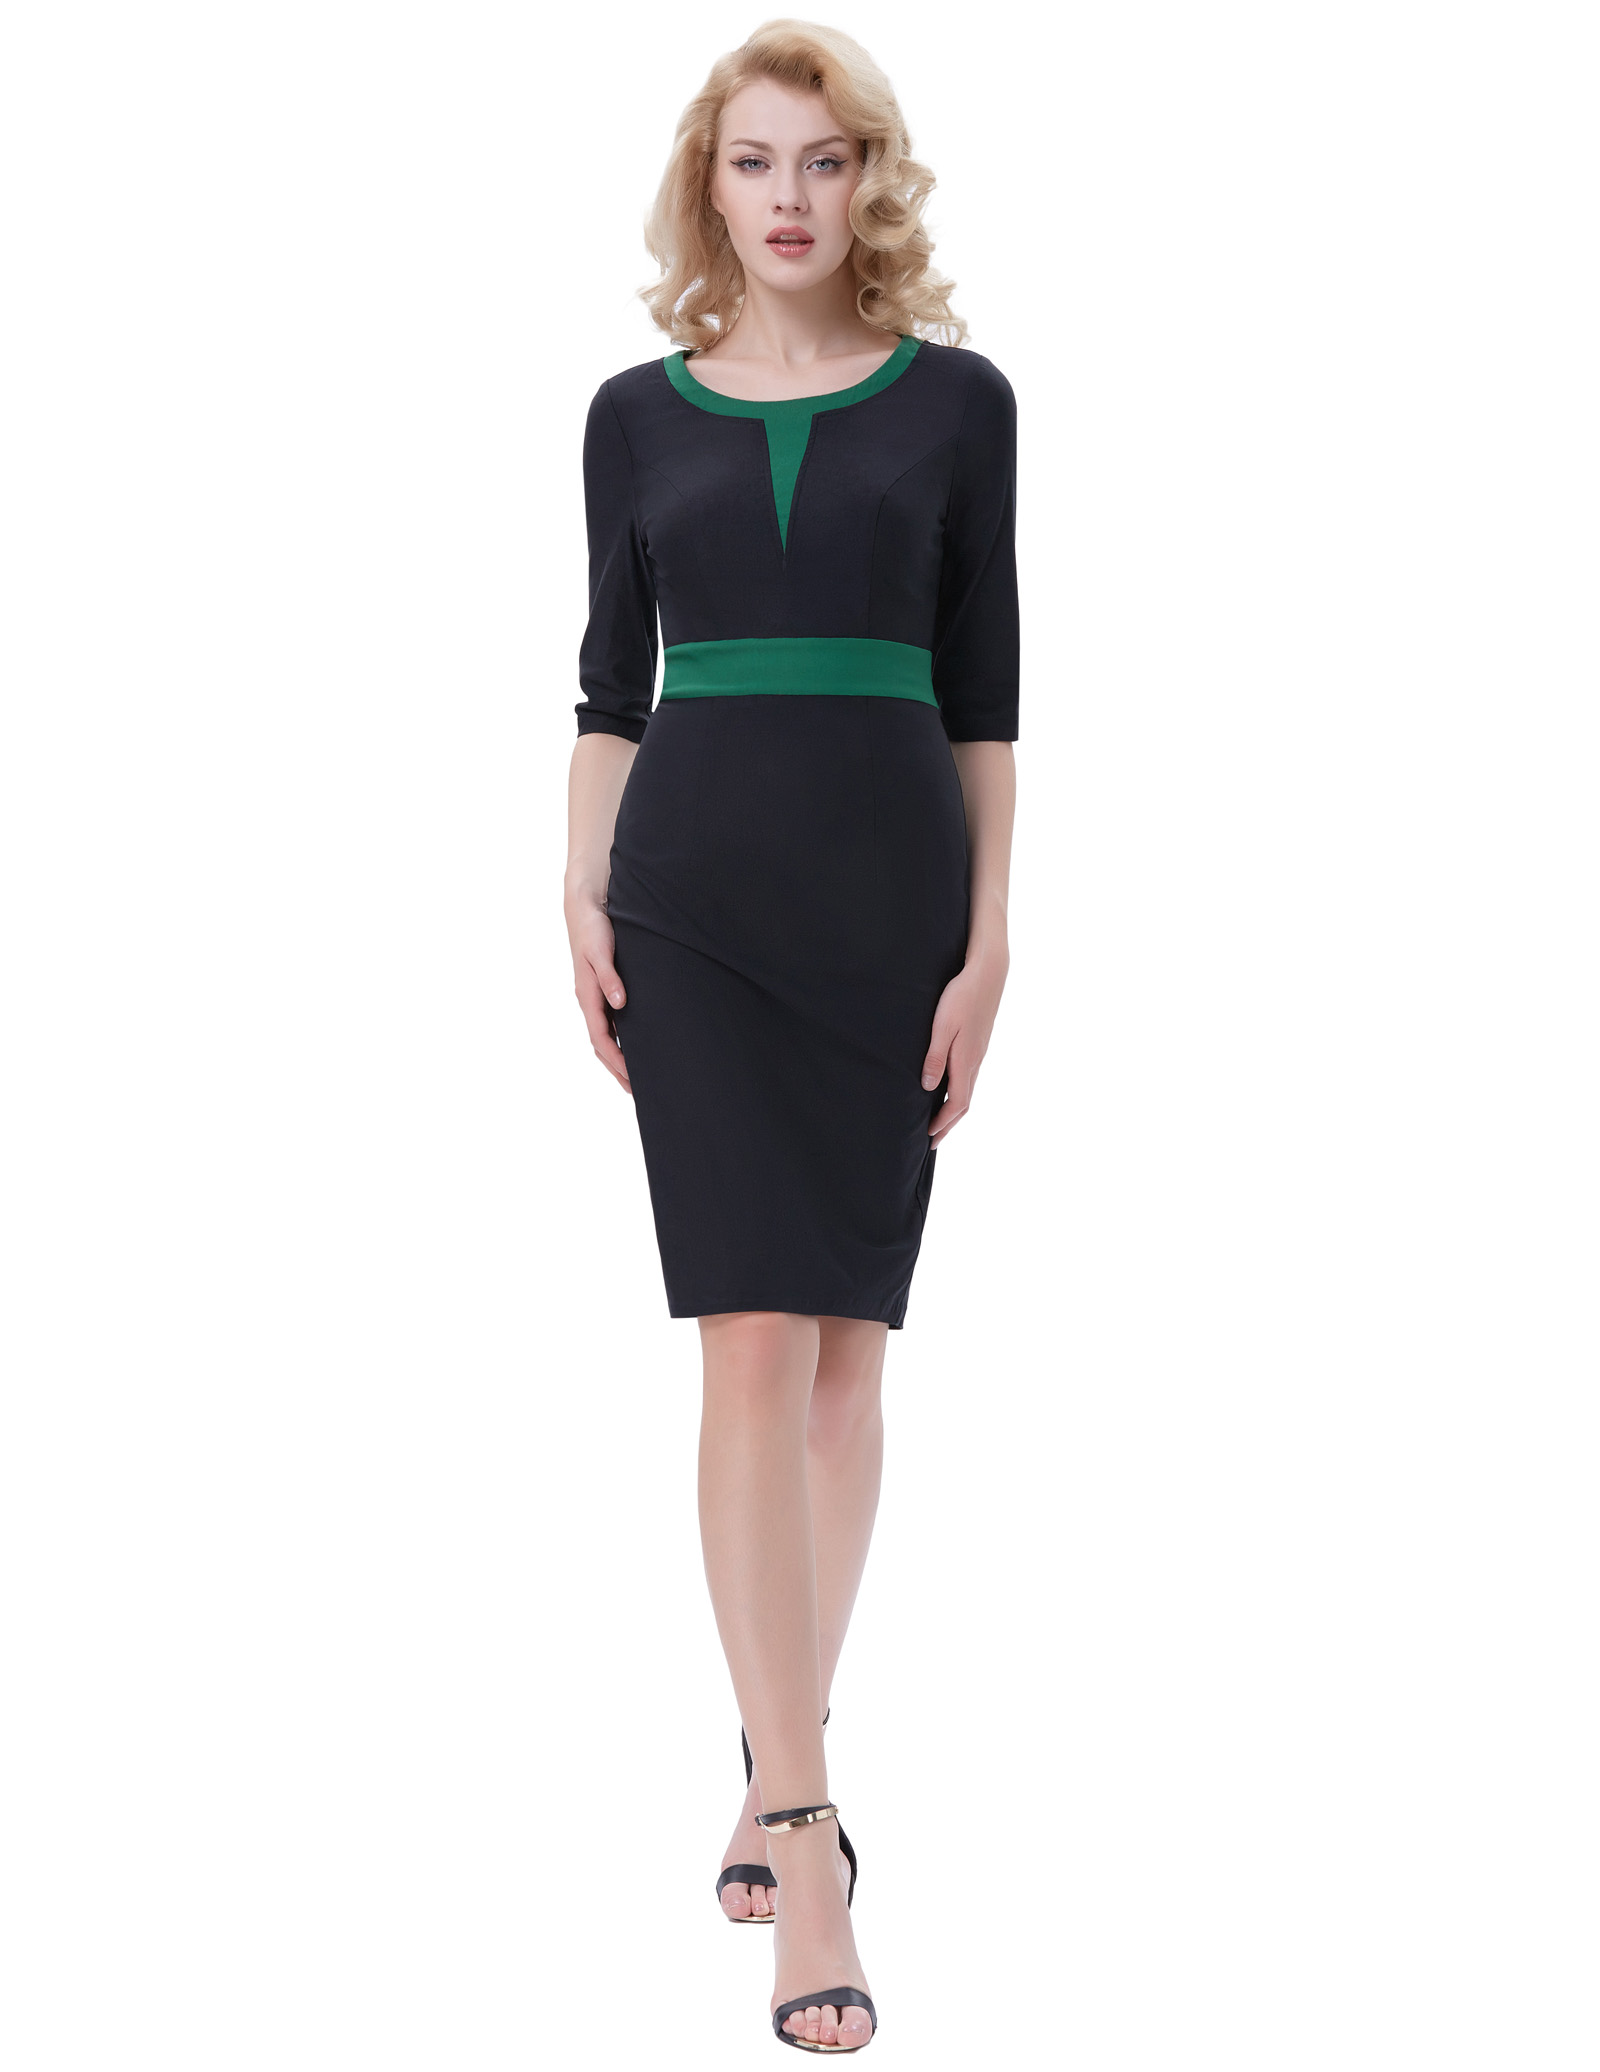 stock Retro Vintage work wrap dress elegant 3/4 Sleeve Crew Neck Contrast Color kim kardashian slim Bodycon Dress women elbise